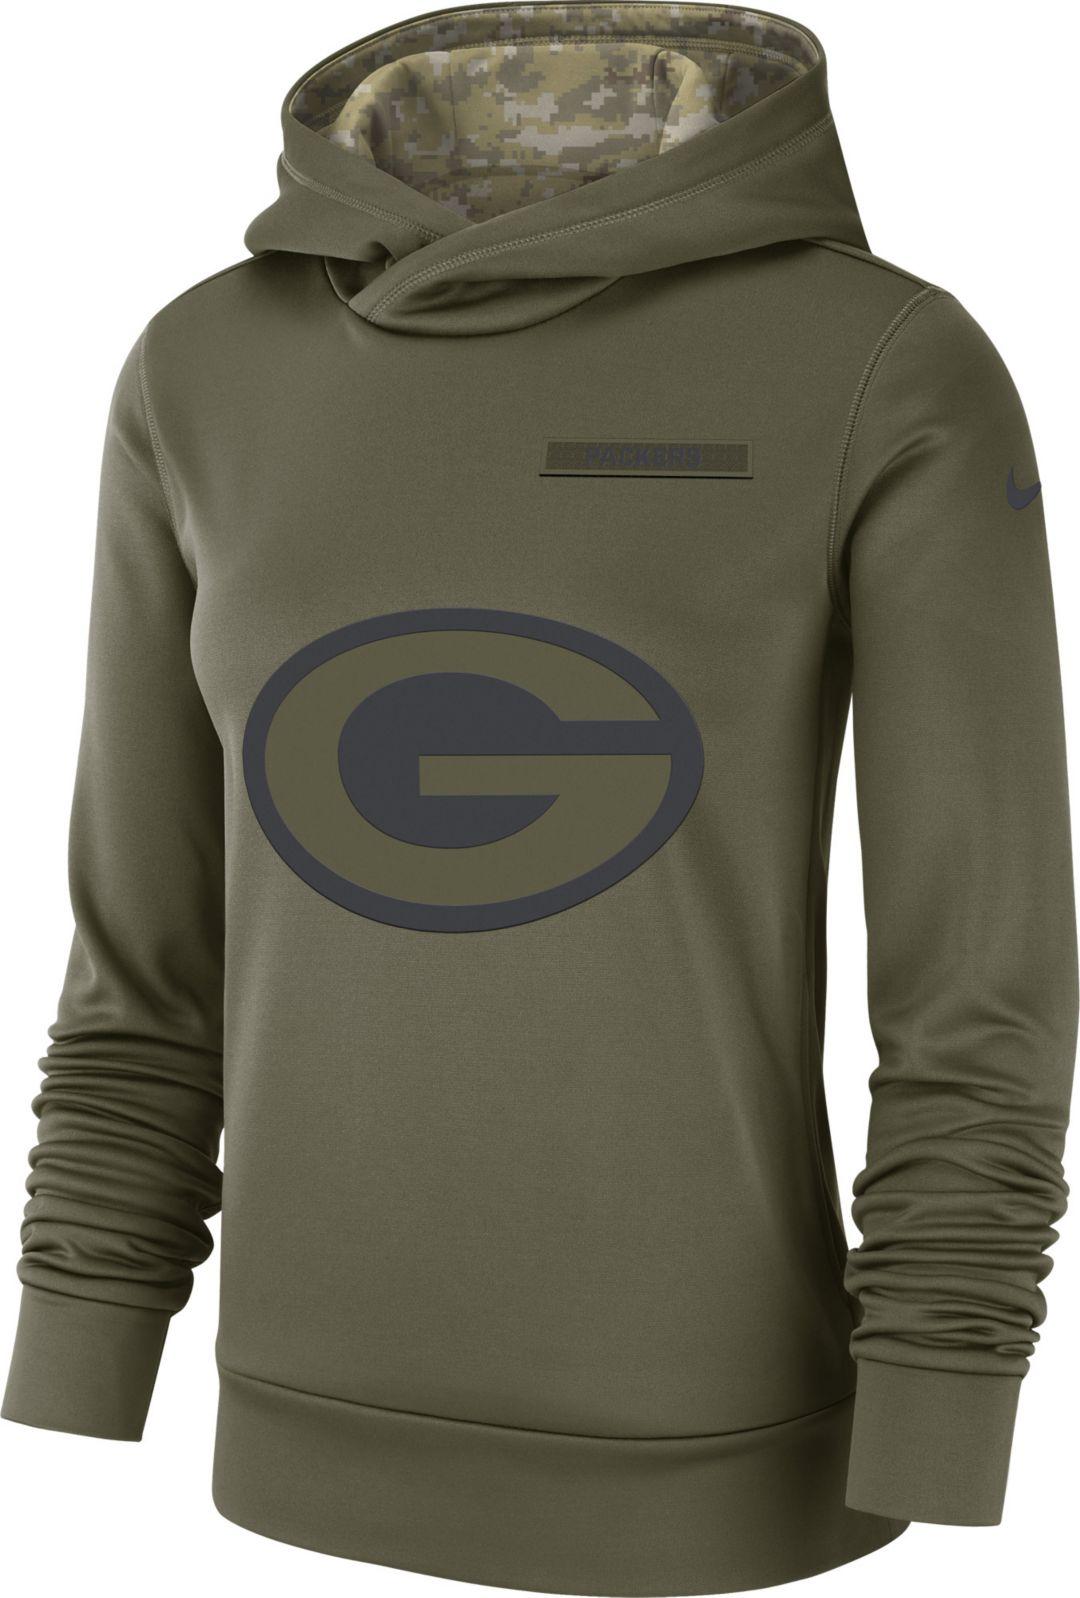 292a40b0b Green Bay Packers Womens Sweatshirts - Nils Stucki Kieferorthopäde